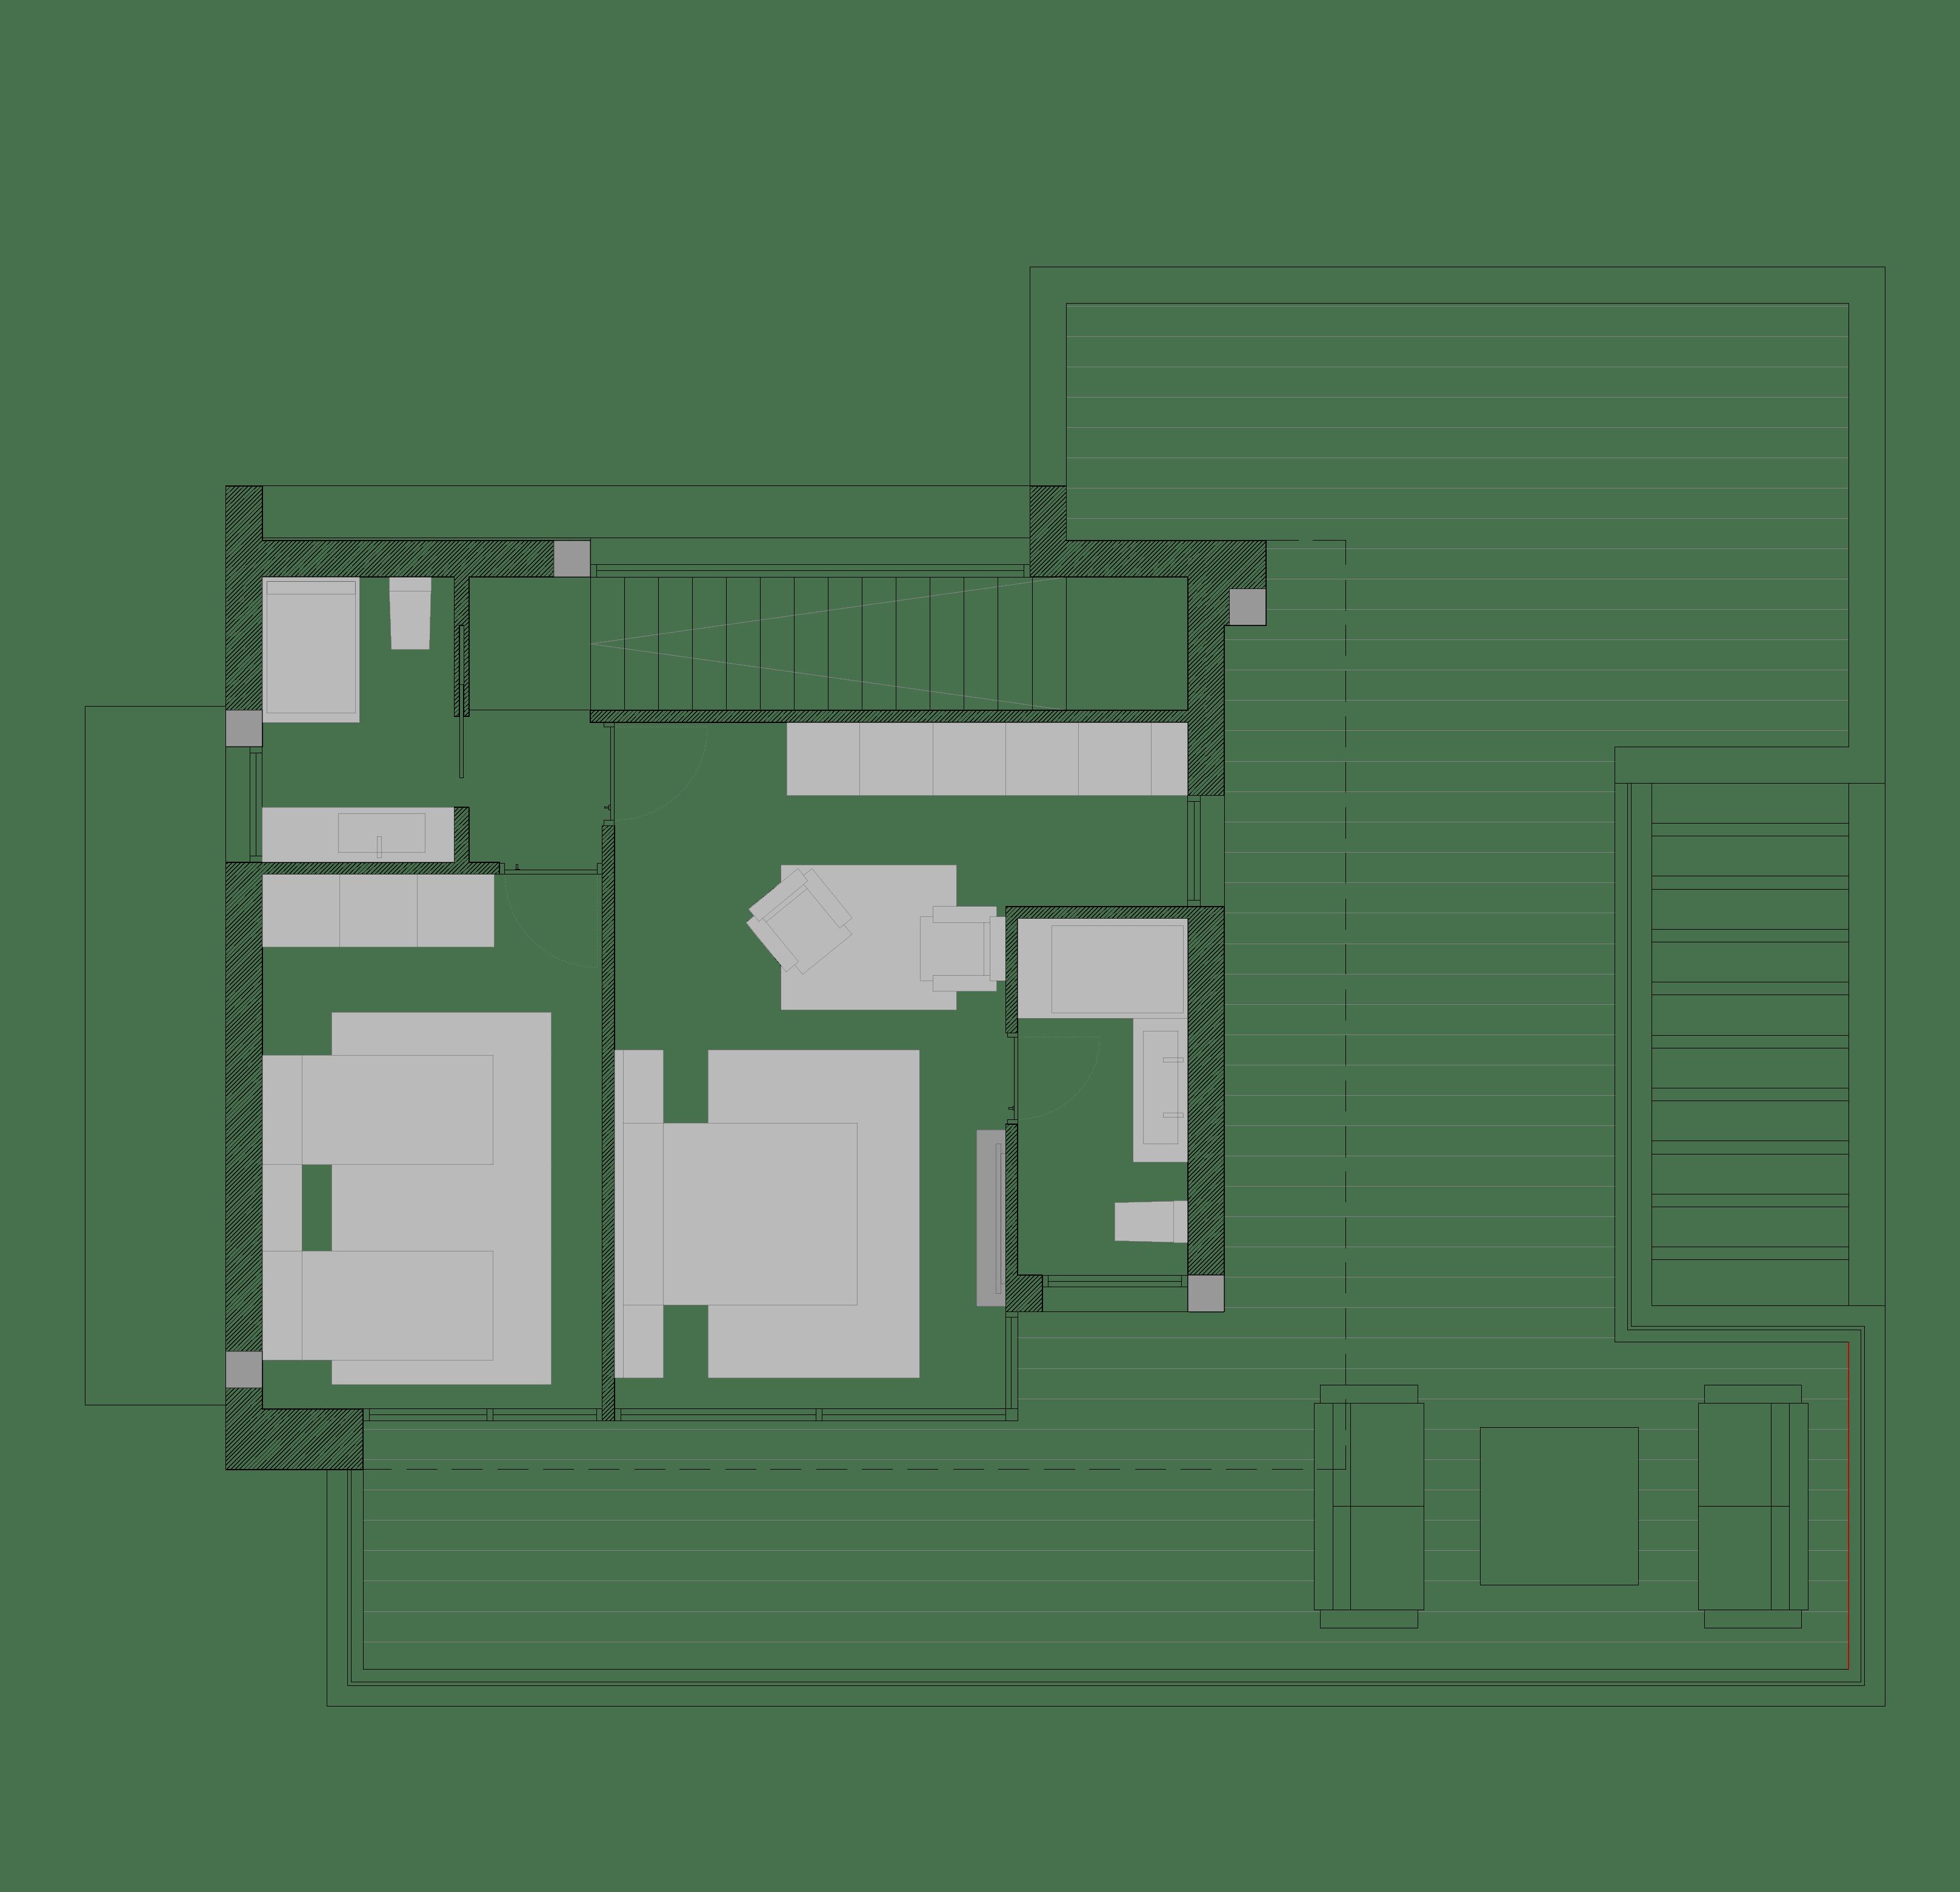 planta-primera-def-03-min